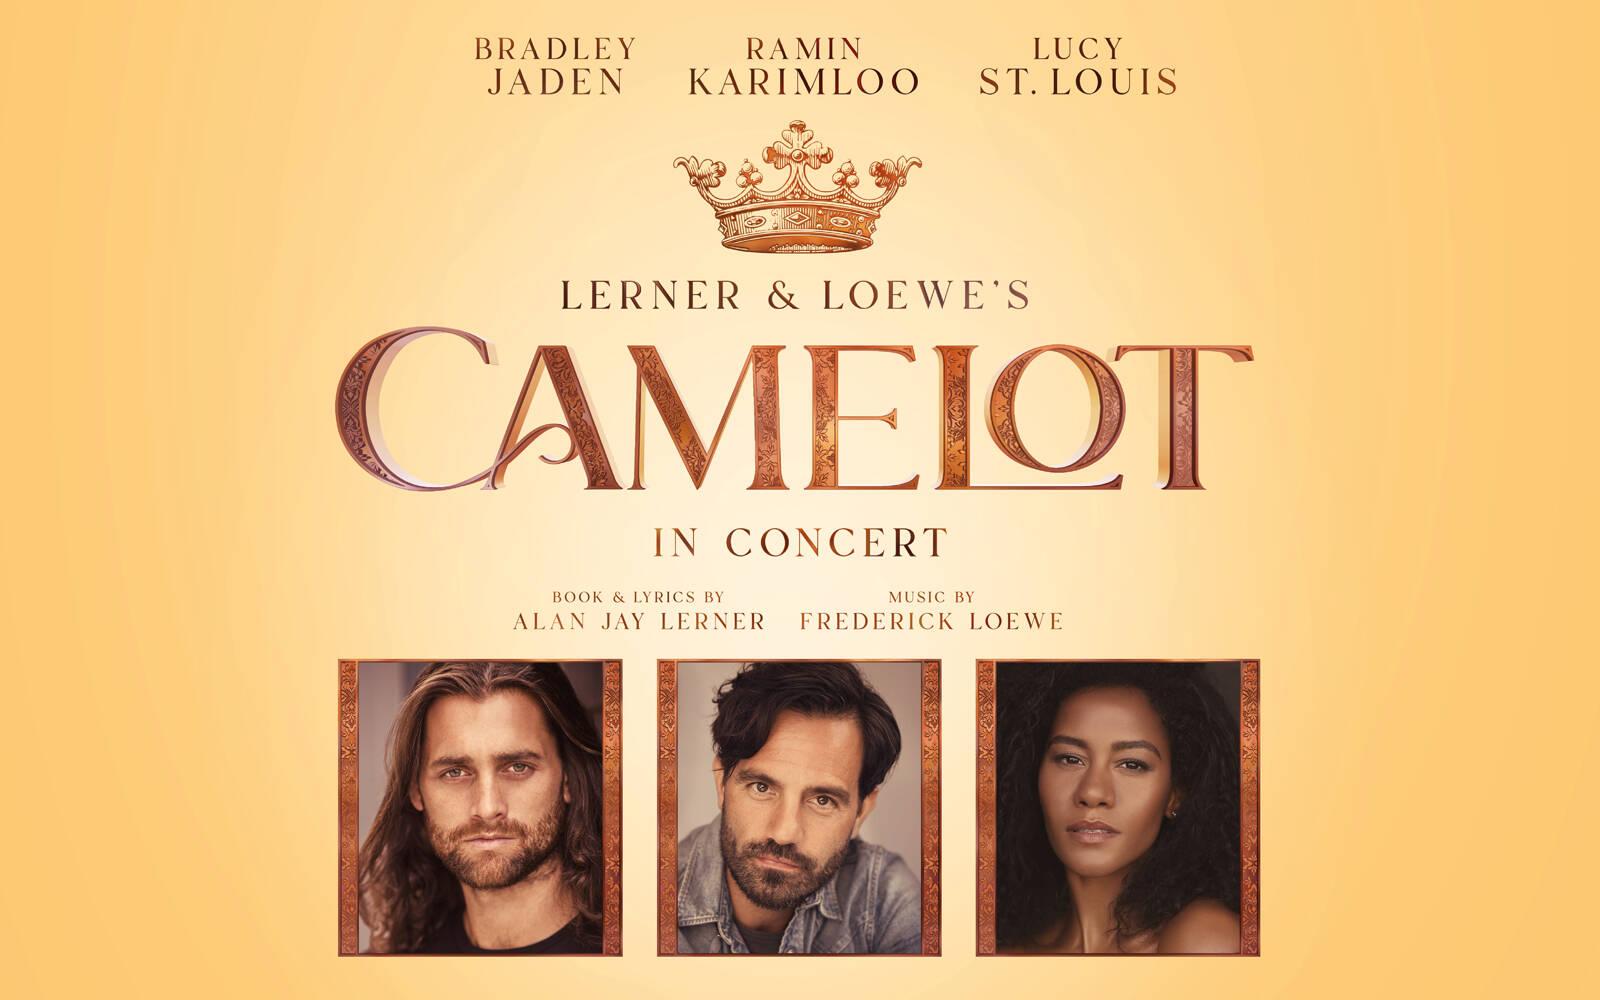 Camelot to star Ramin Karimloo, Bradley Jaden and Lucy St. Louis